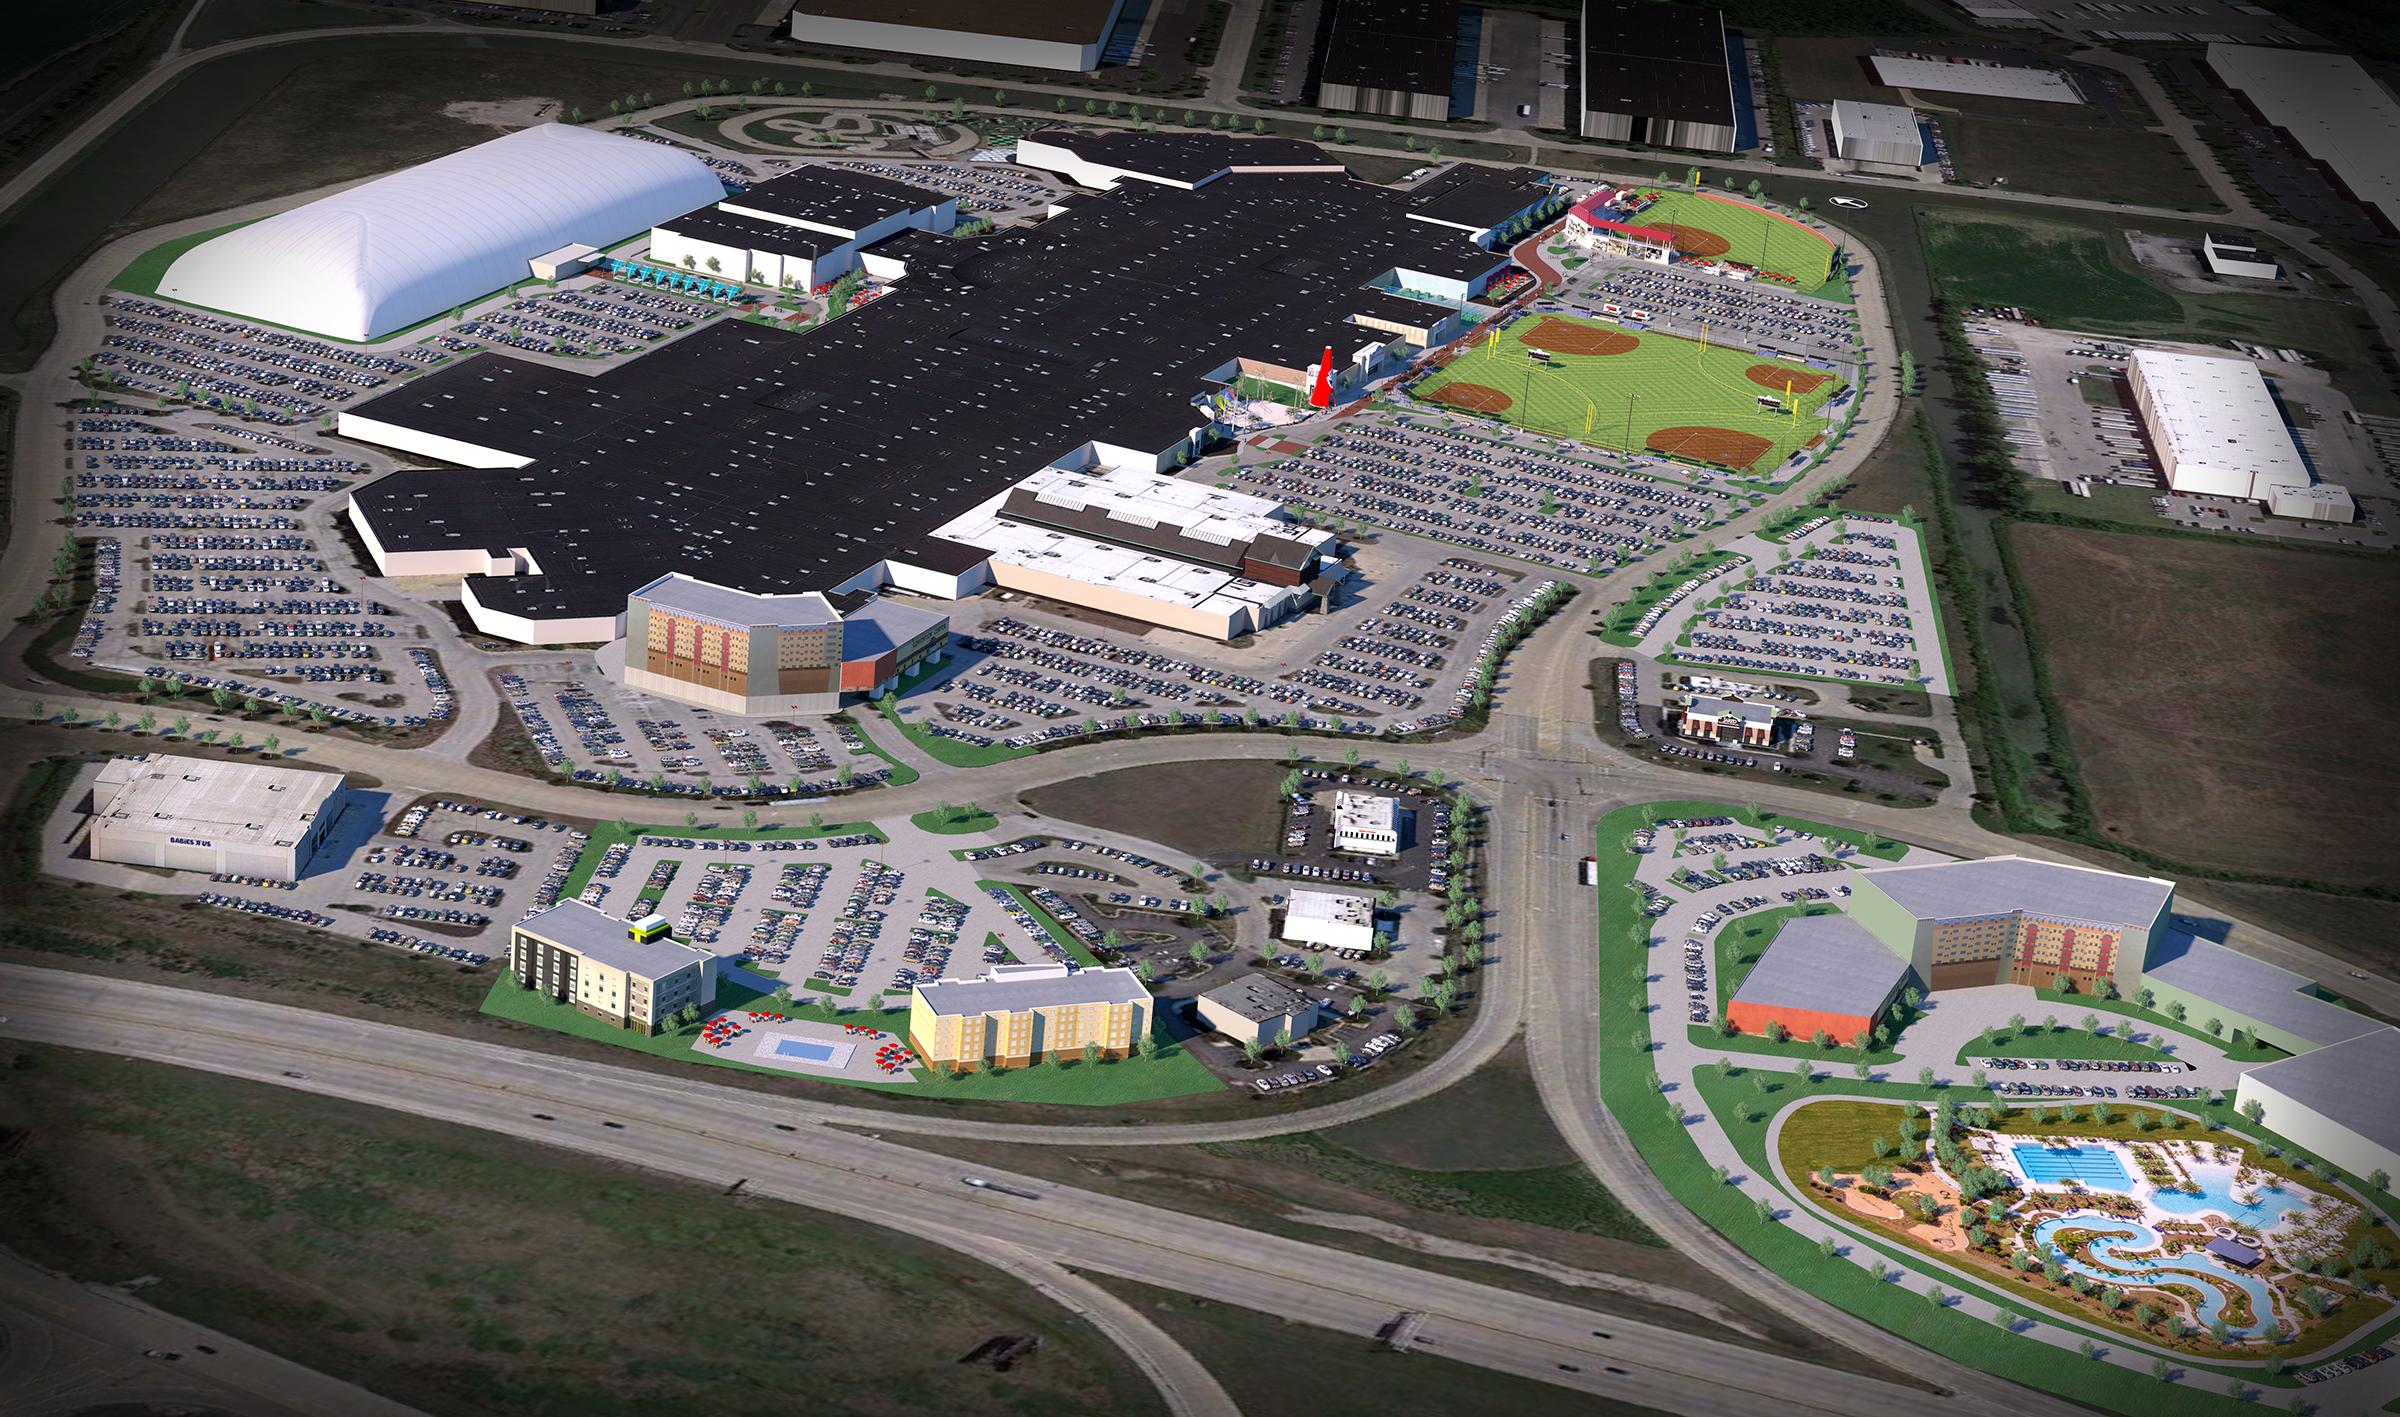 Youth sports complex 'PowerPlex' will open in St  Louis